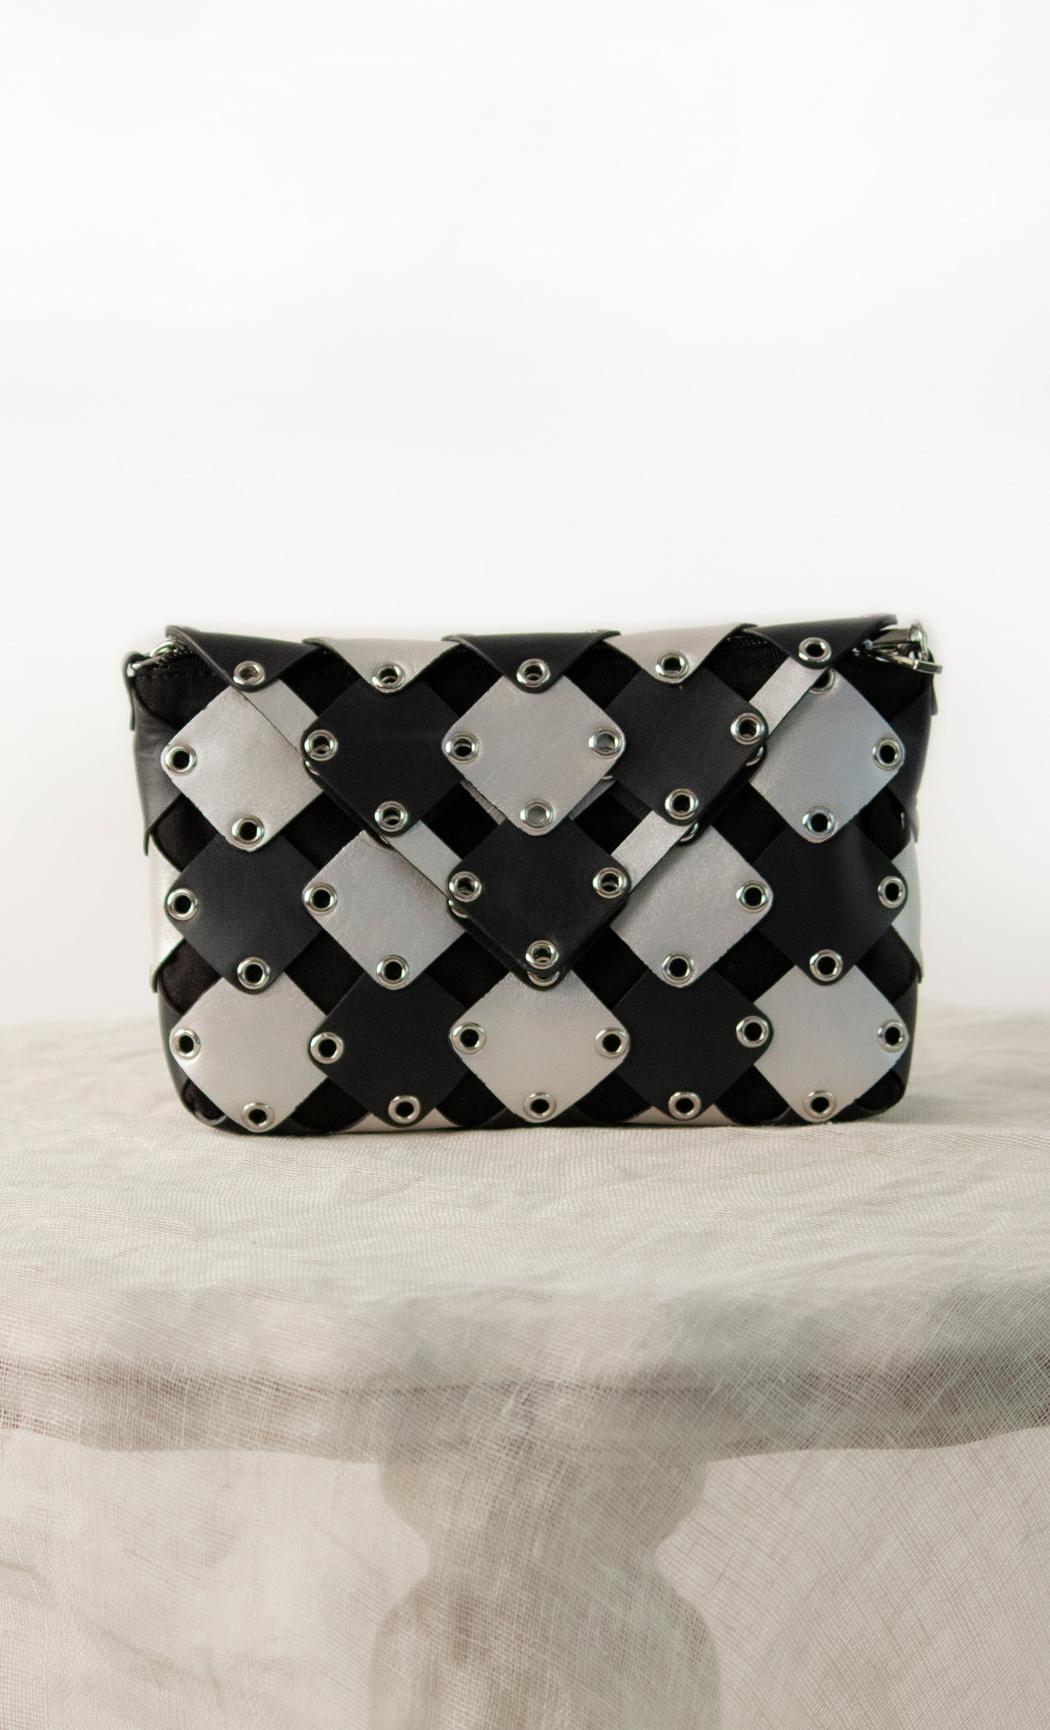 Square Stud Clutch in Silver-Black. Buy Online